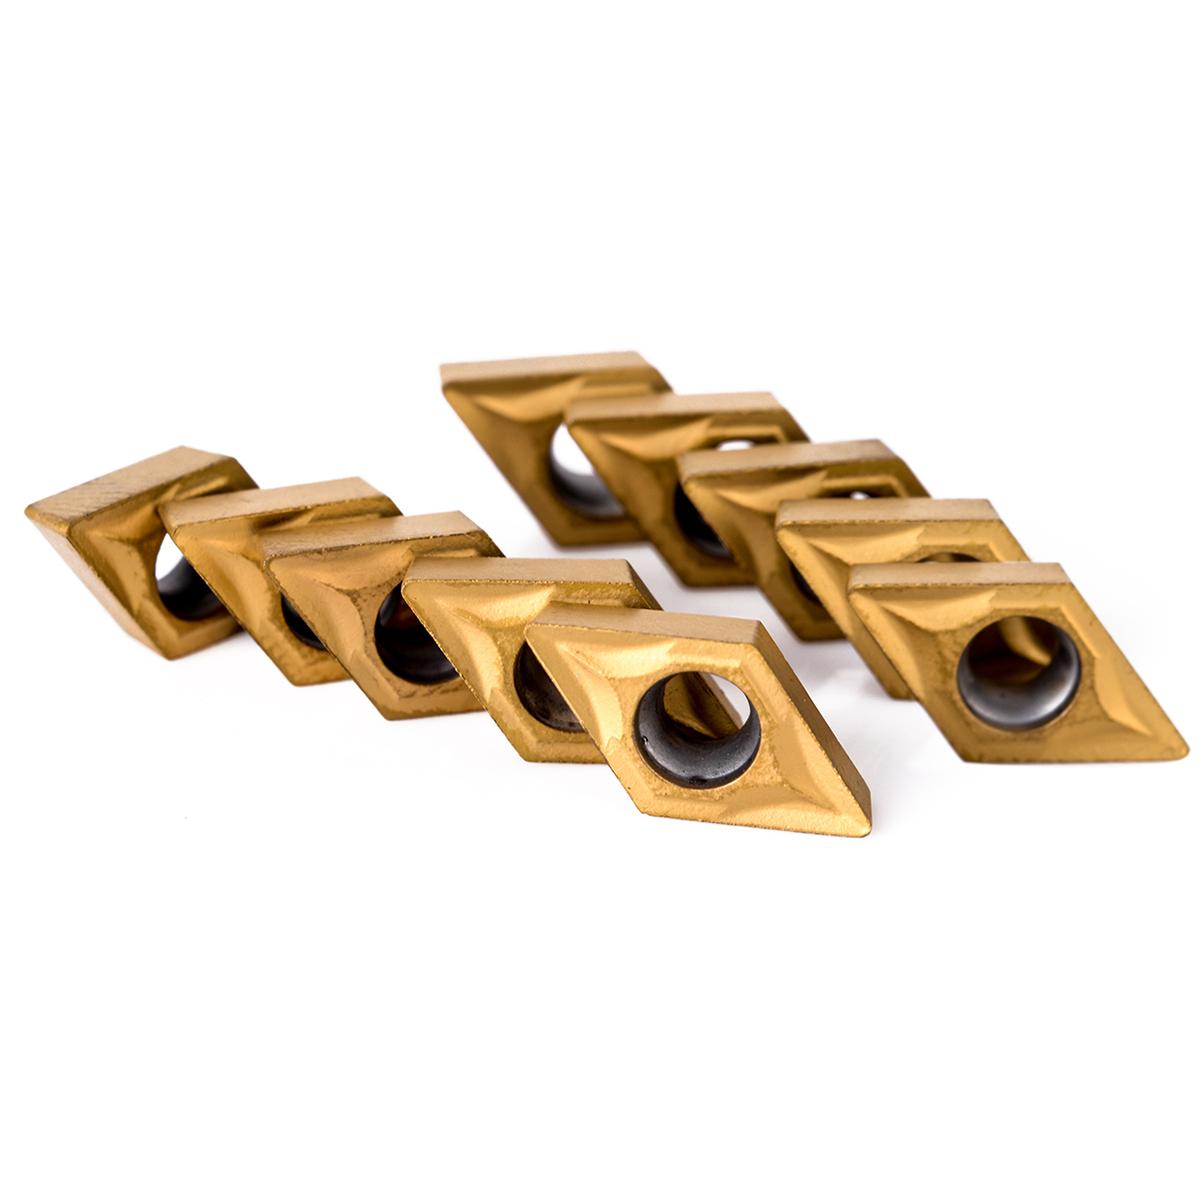 10pcs DCMT070204 Carbide Insert + 4pcs 12mm Boring Bar Tool Holder + 4pcs Wrench For Lathe Turning Tool